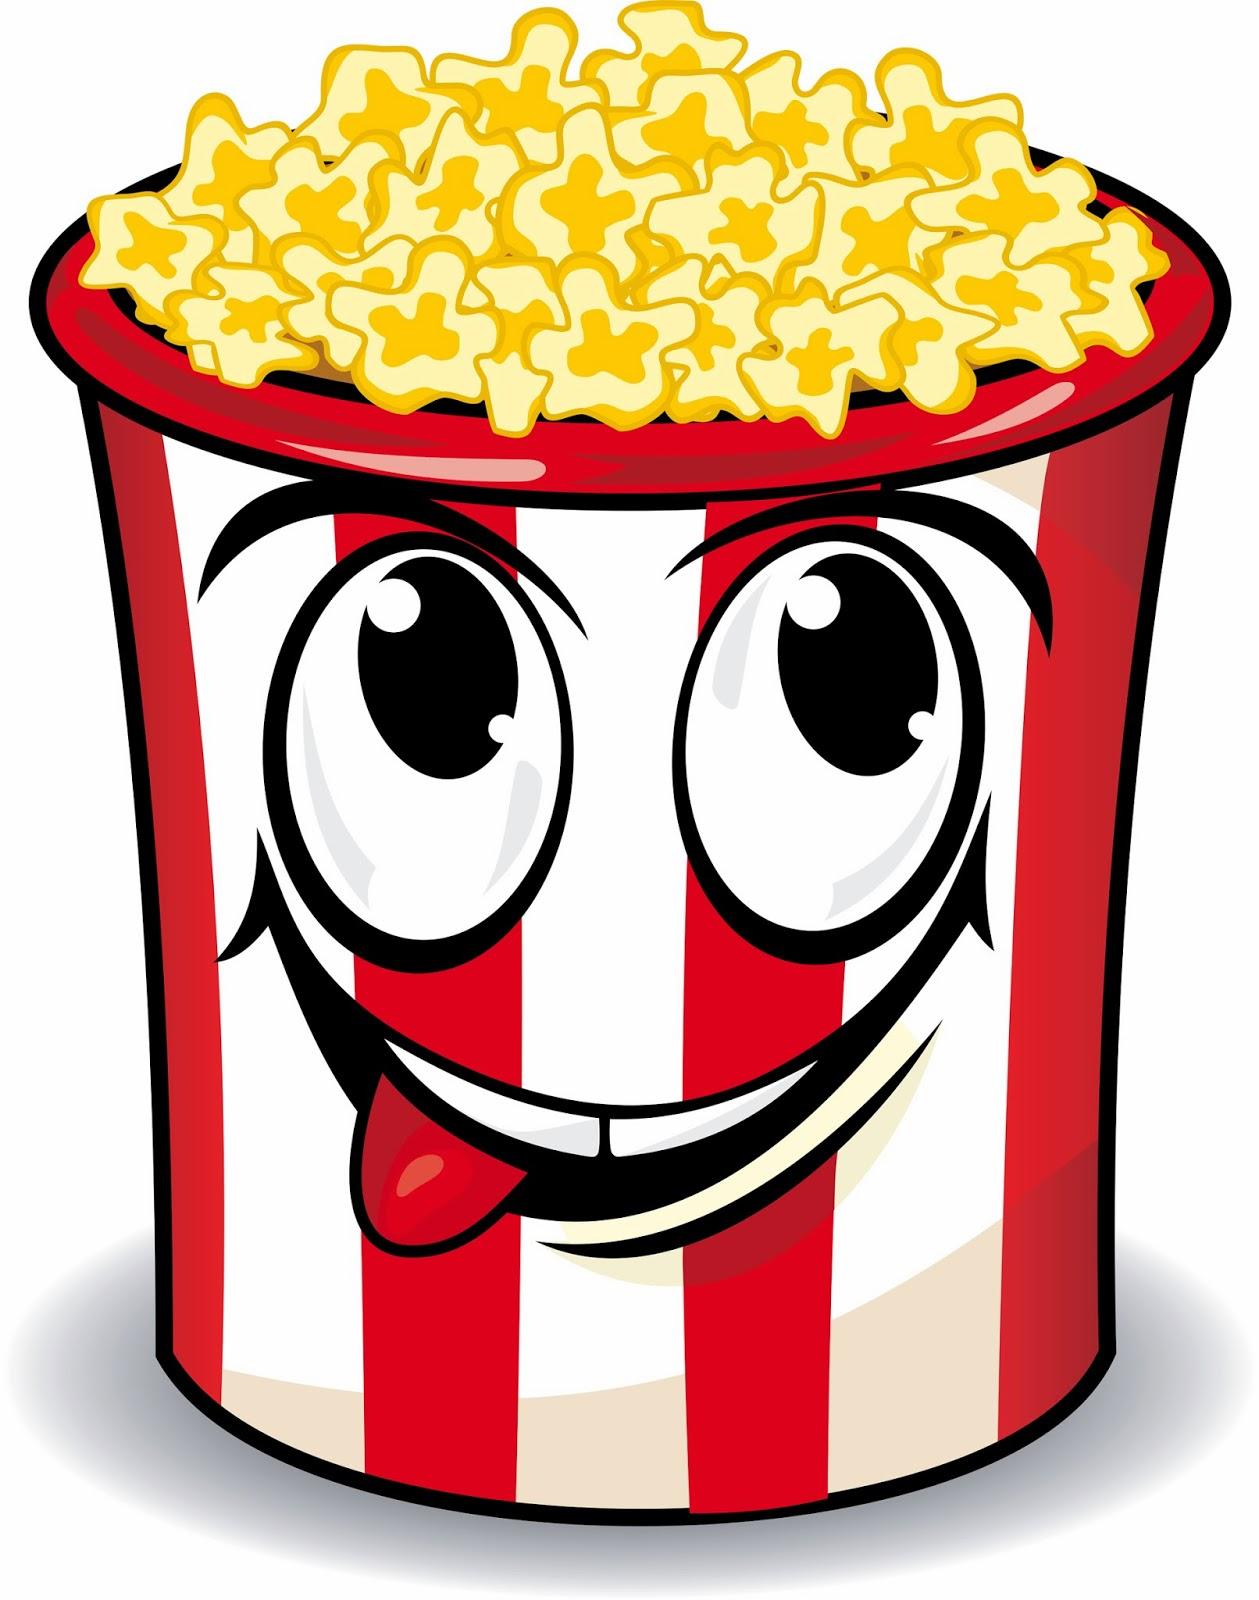 Popcorn clipart free clip art .